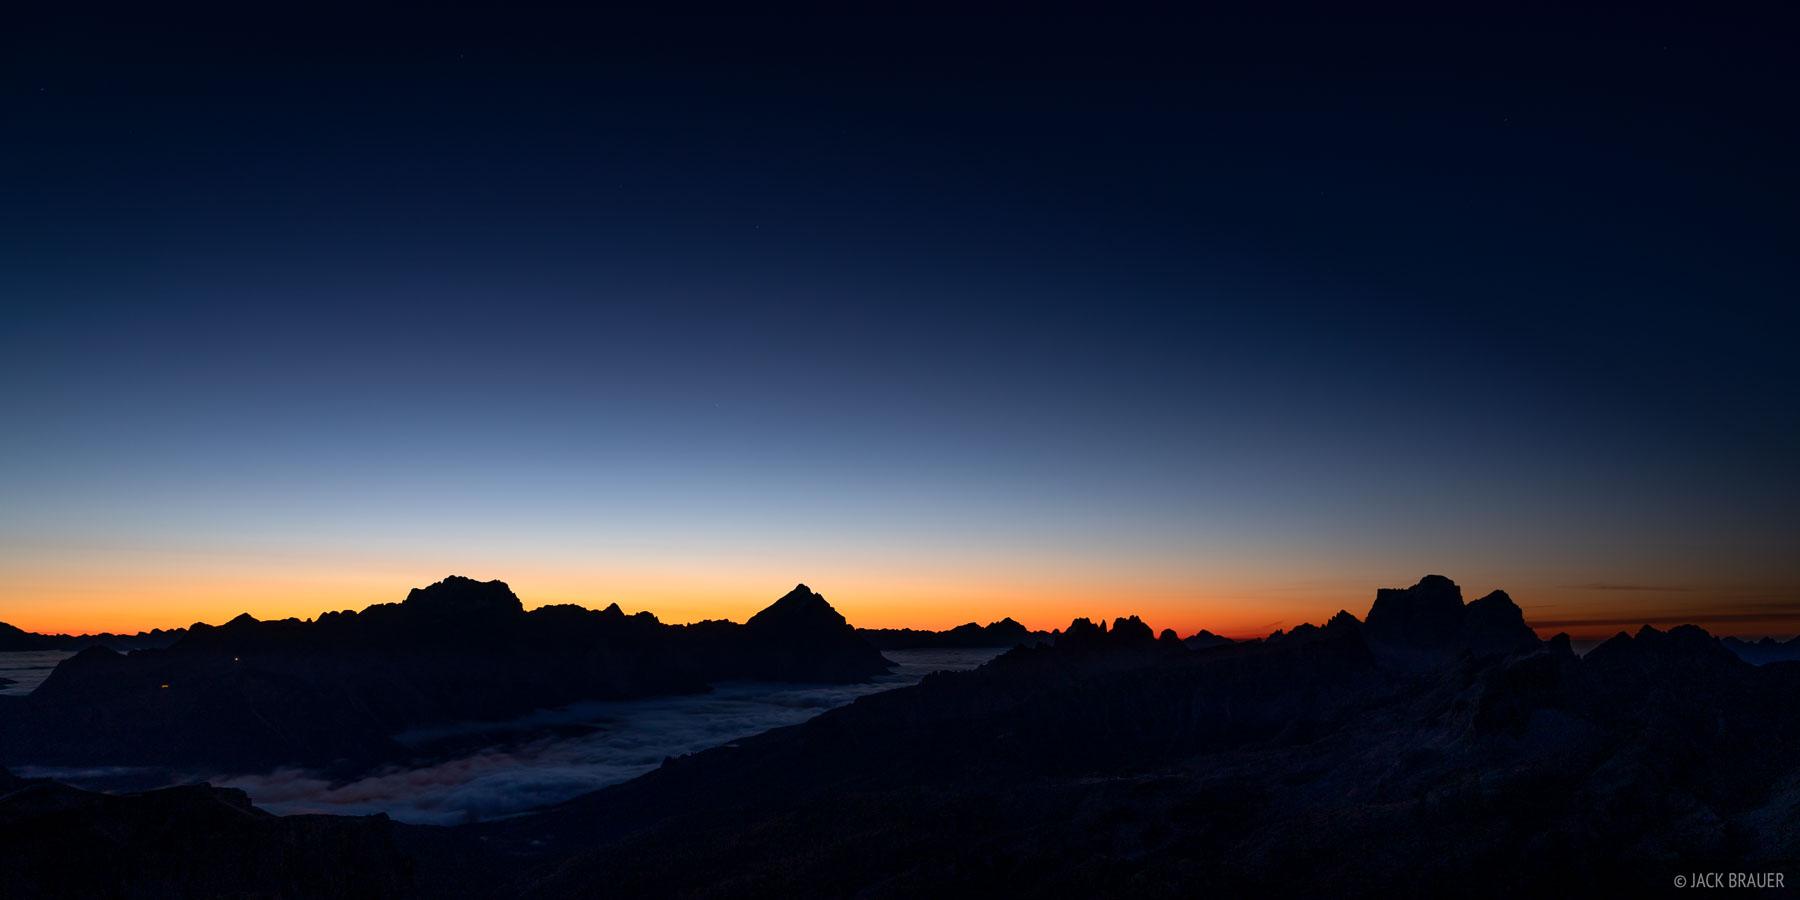 Dolomites, Gruppo del Sorapis, Italy, Lagazuoi, Monte Antelao, Monte Pelmo, November, Alps, photo